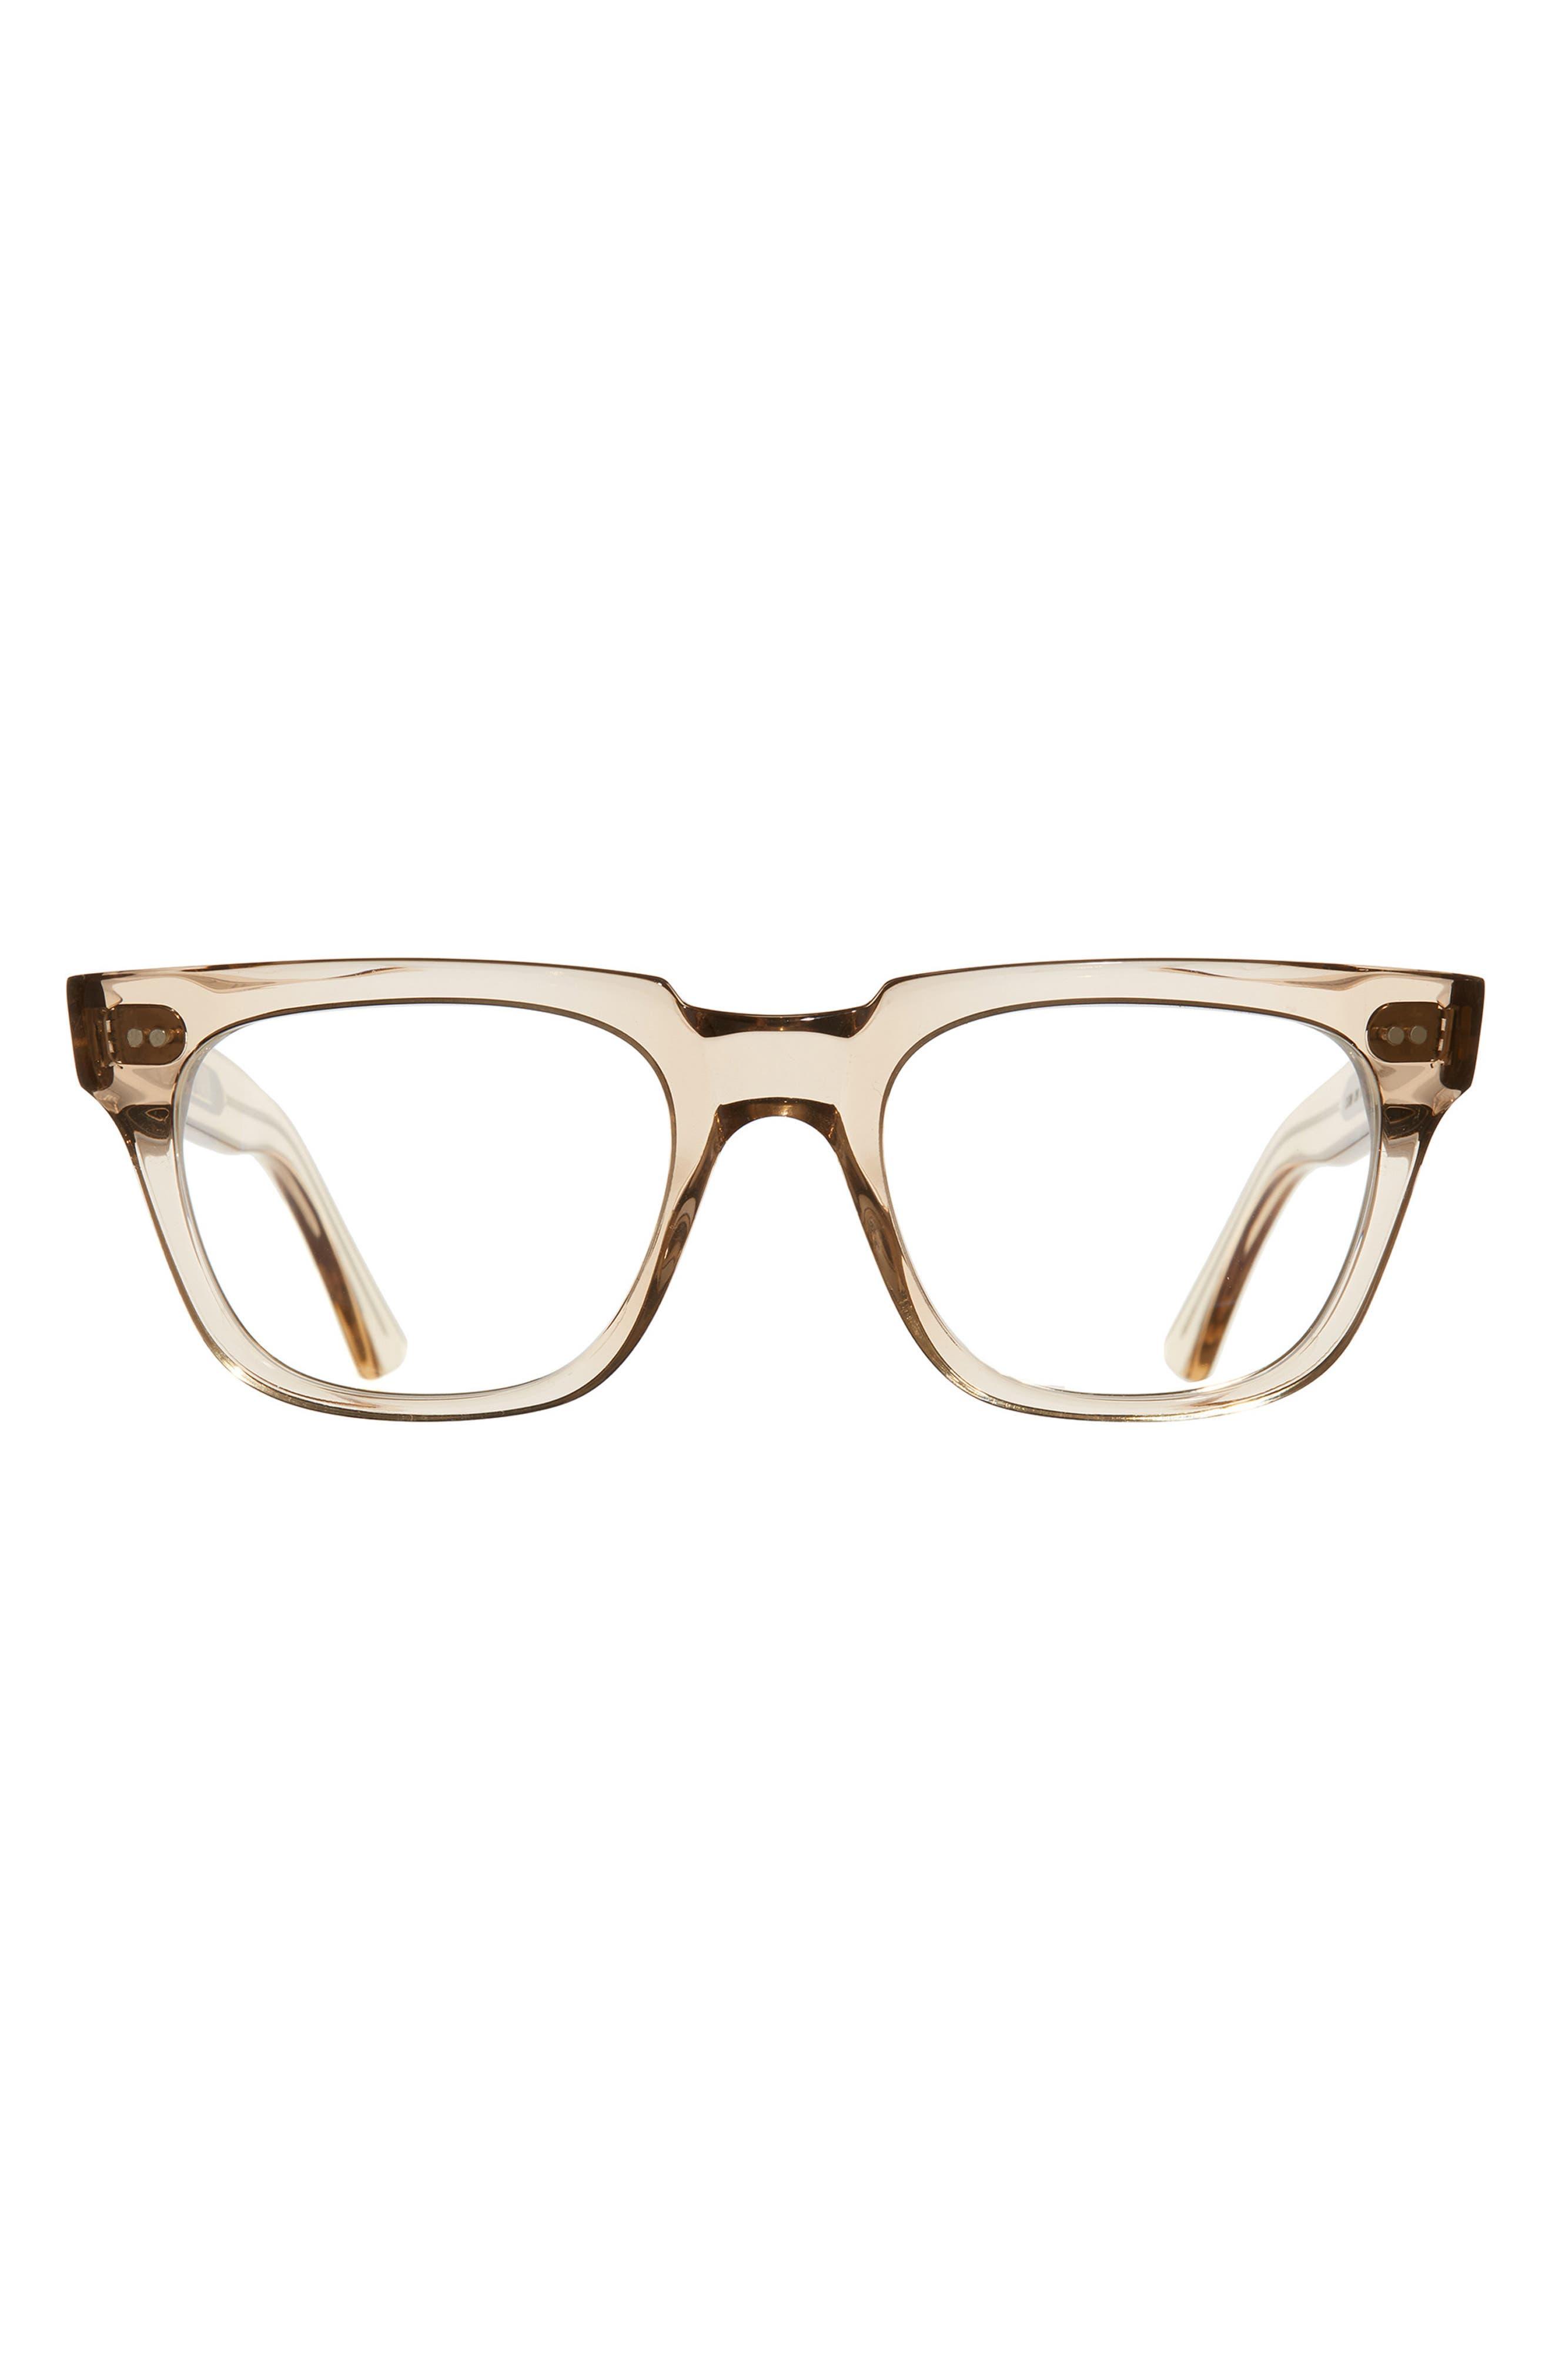 53mm Rectangle Blue Light Blocking Glasses